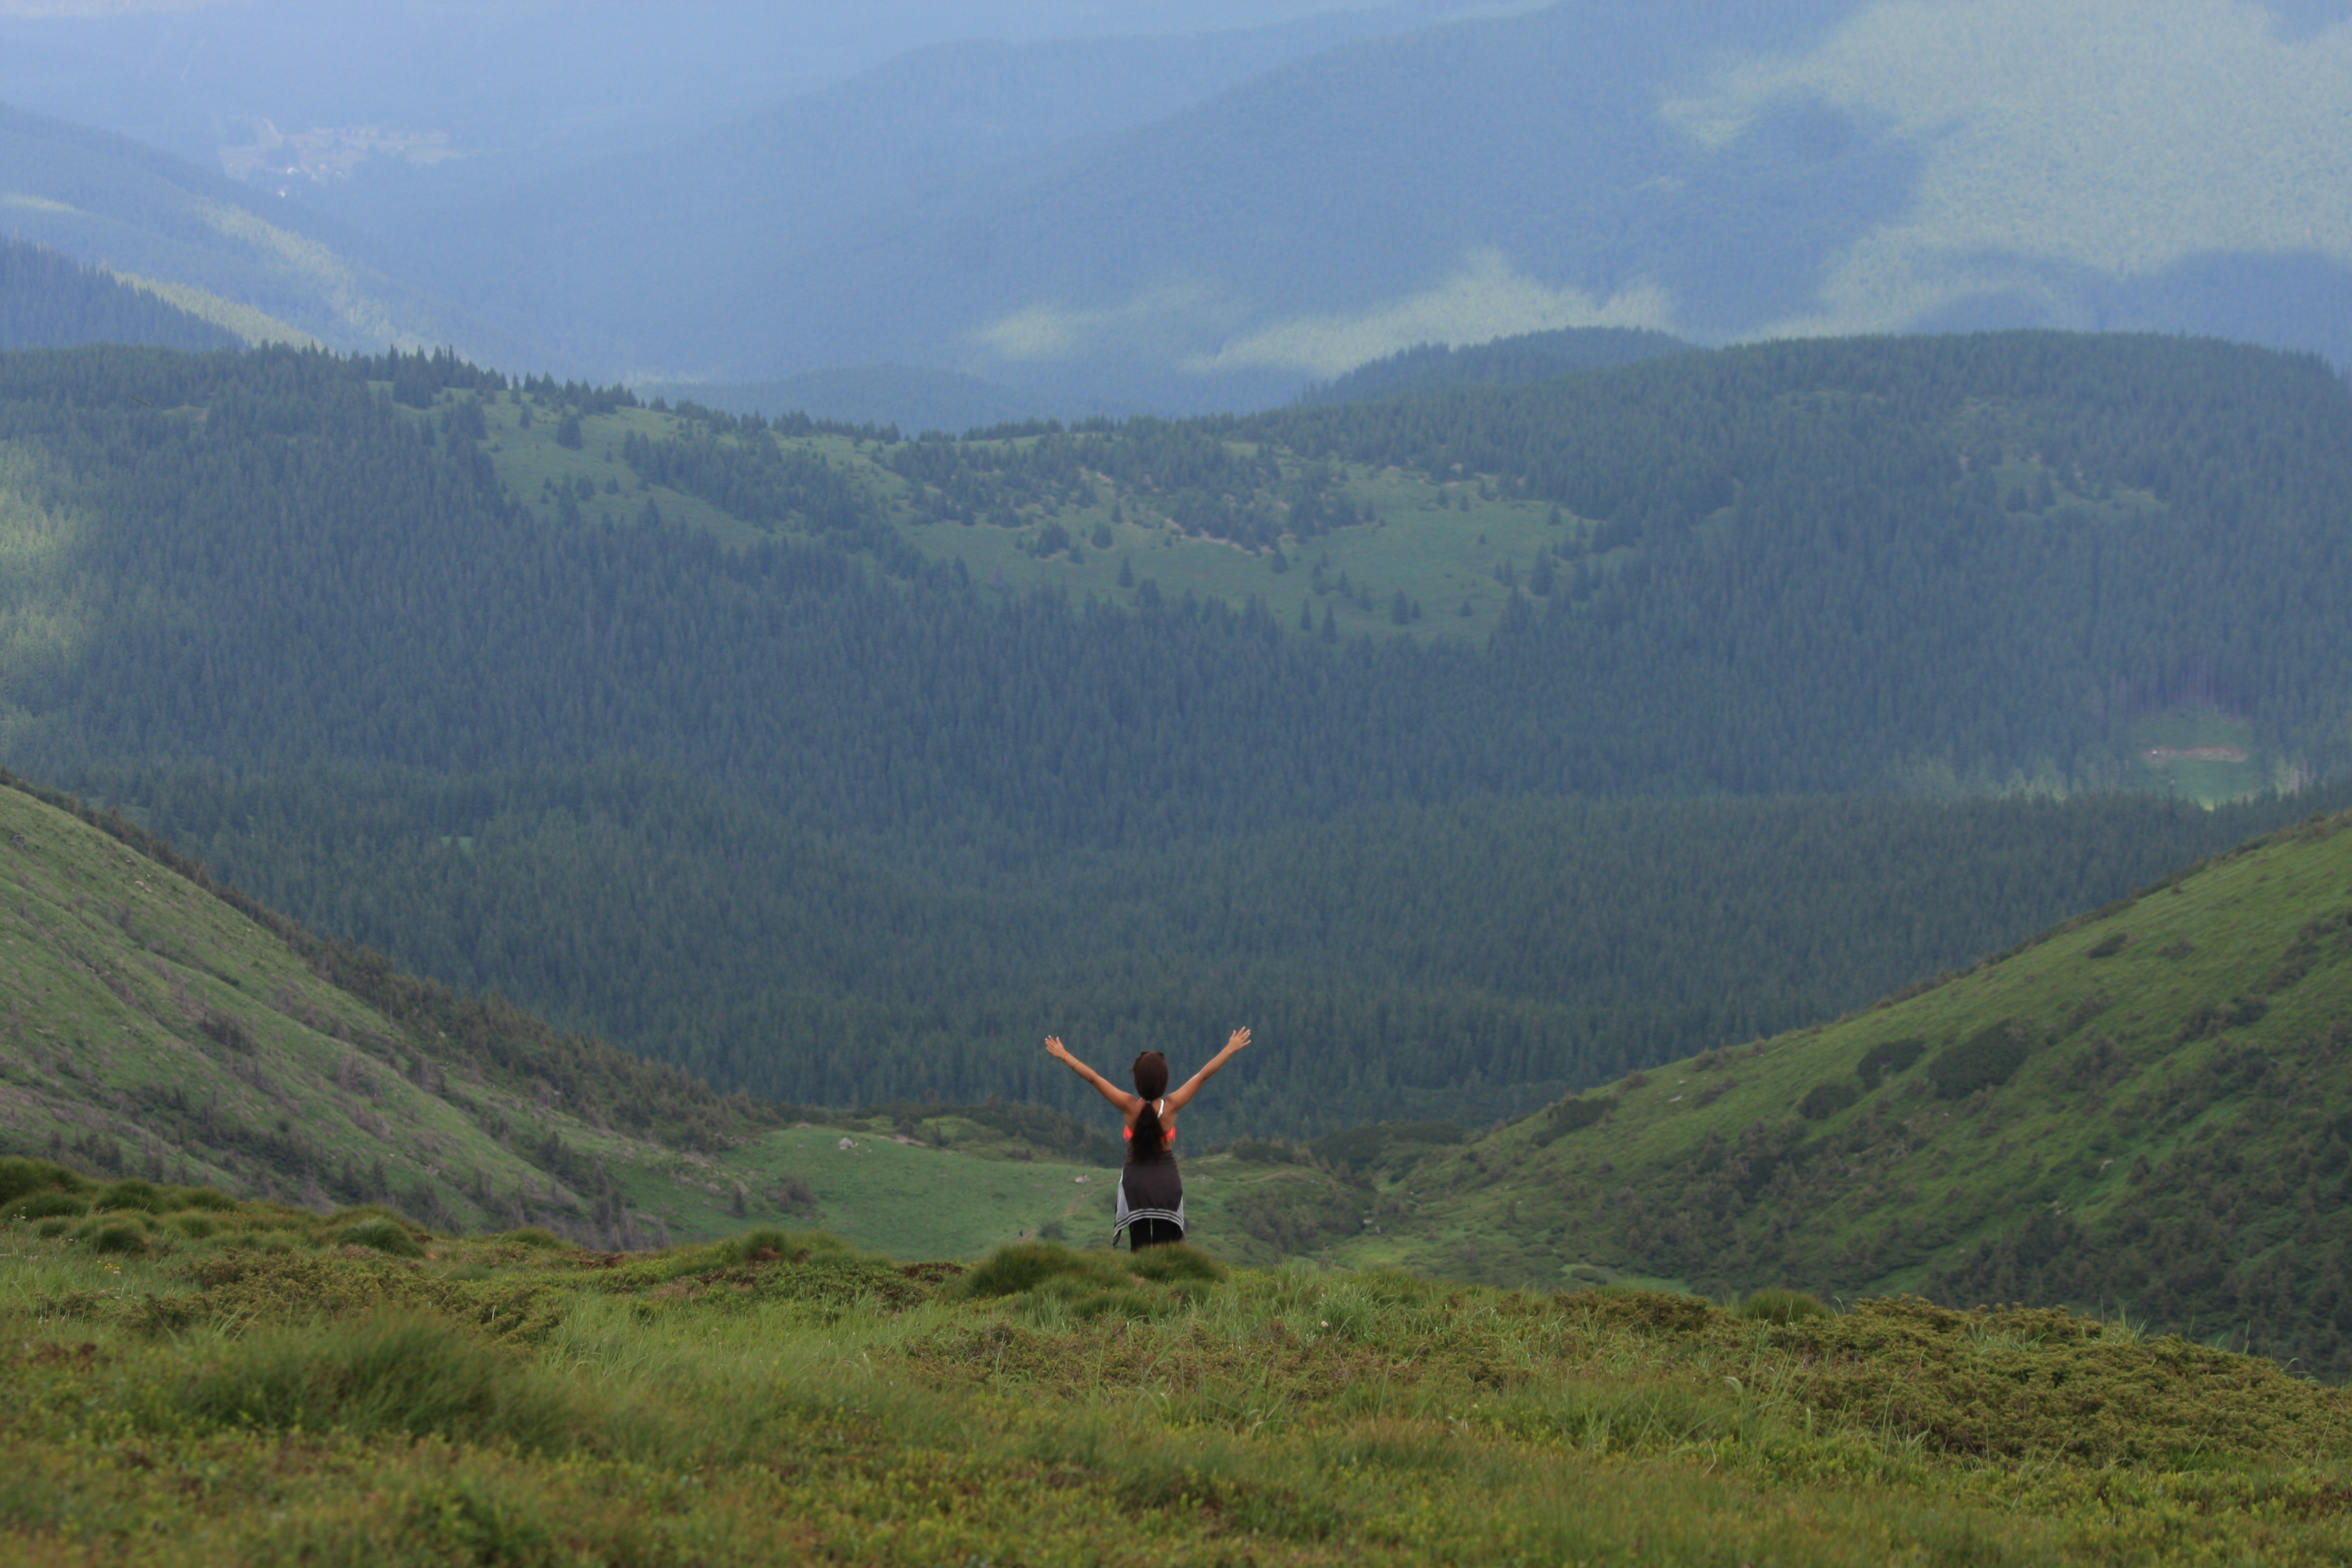 Маршрут із Києва в Карпати: підйом на Говерлу, рафтинг та басейн в горах